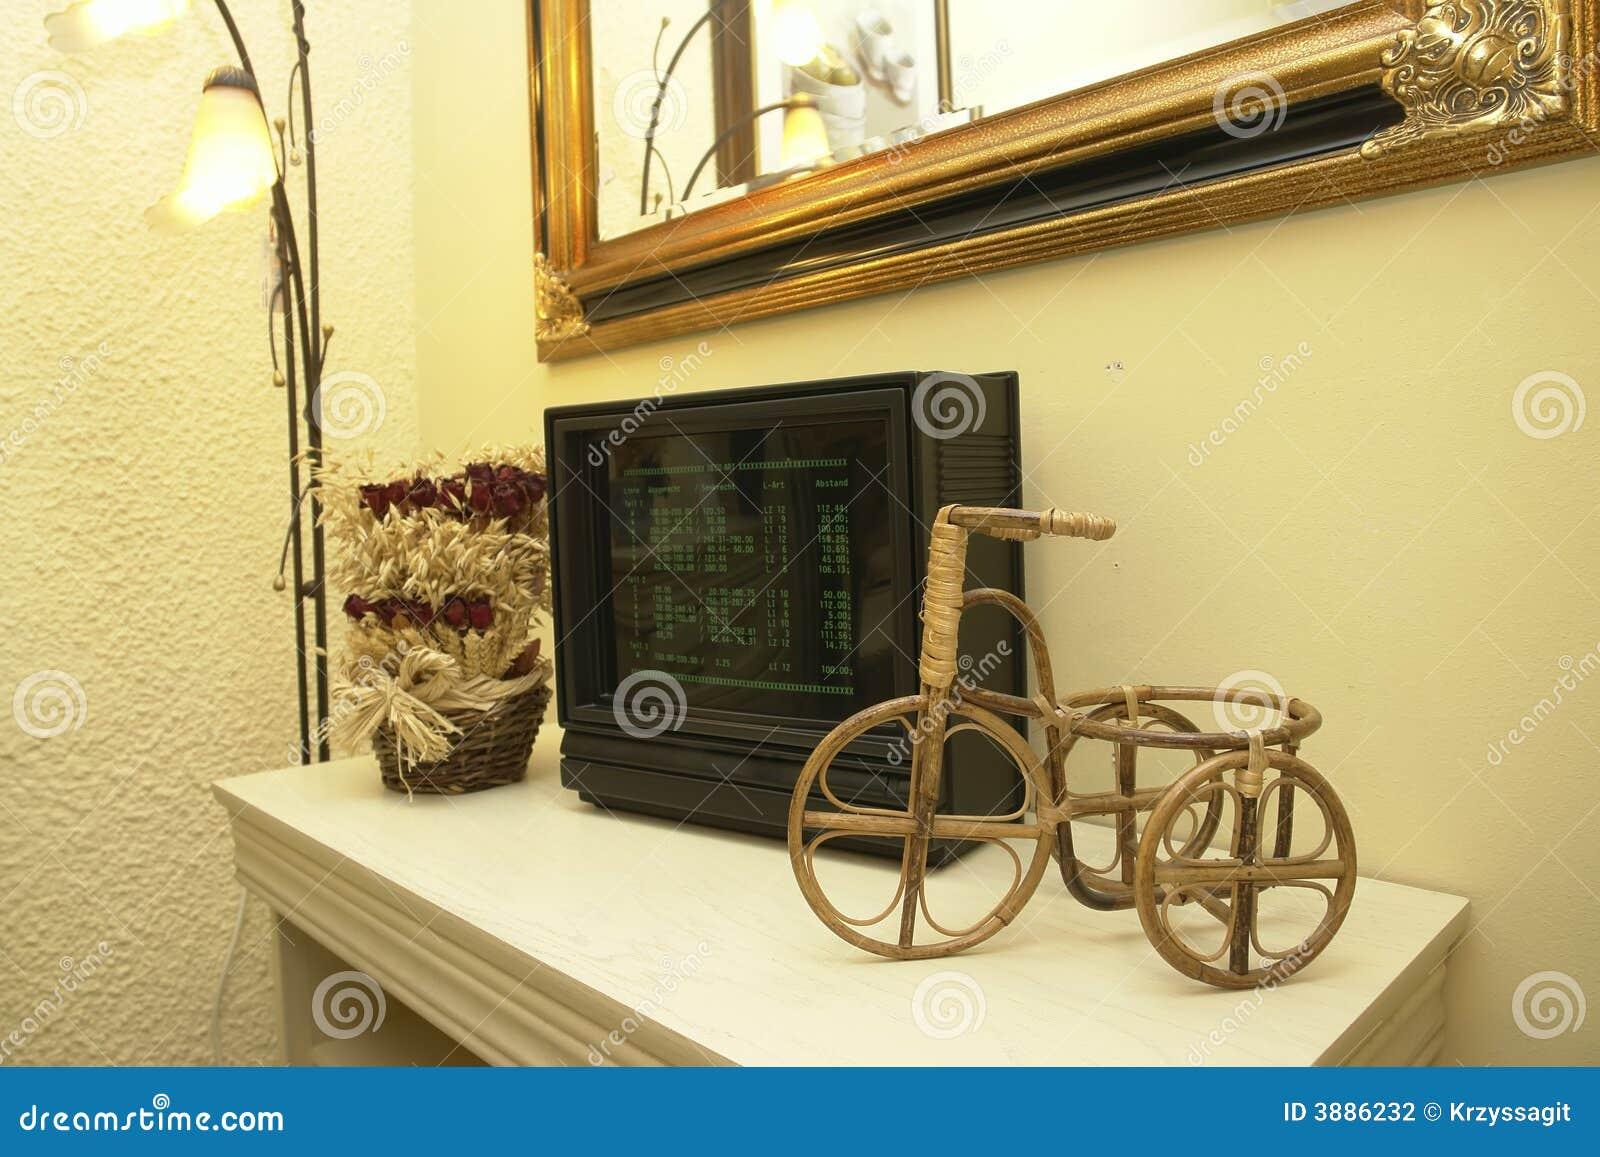 Decorative items on shelf stock photo. Image of ornaments - 3886232